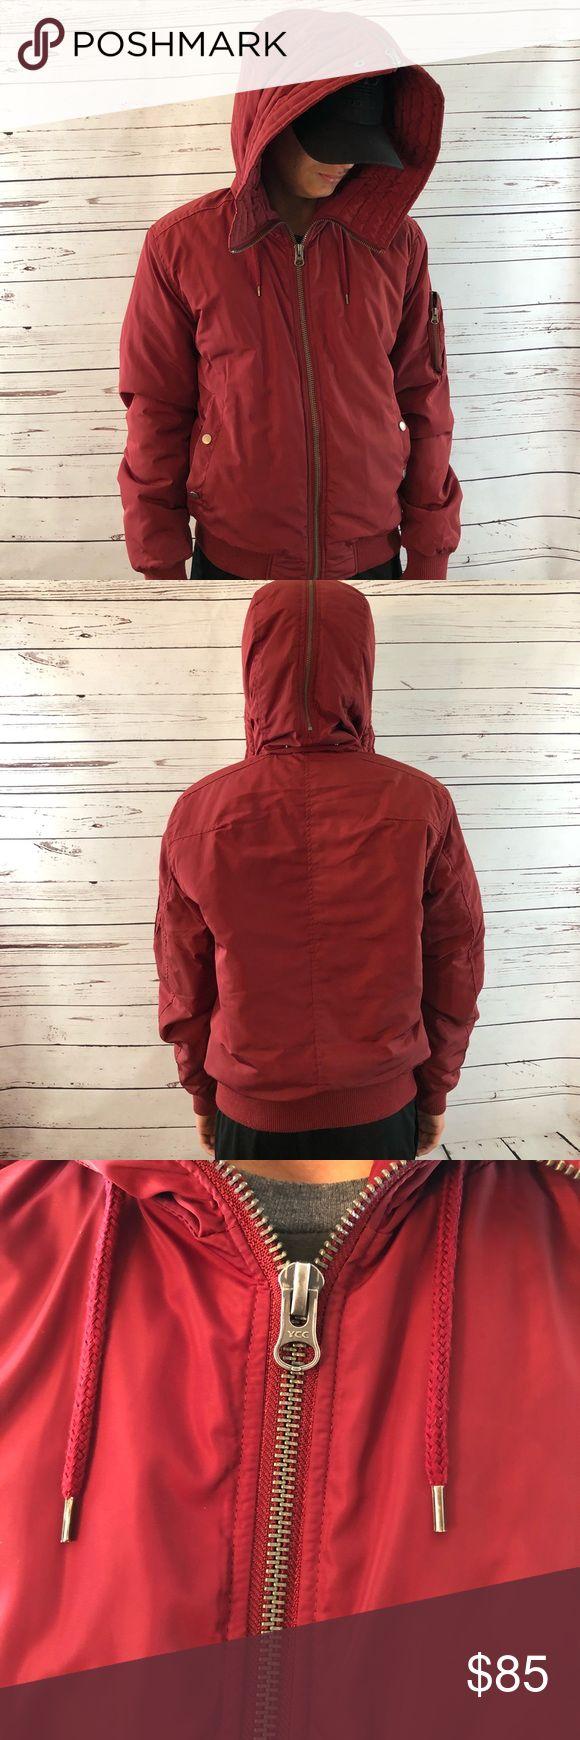 Topman Split Hoodie Burgundy Great condition  Size Medium Double front zipper Split Zipper hoodie Hard to find Super stylish Item681 Topman Jackets & Coats